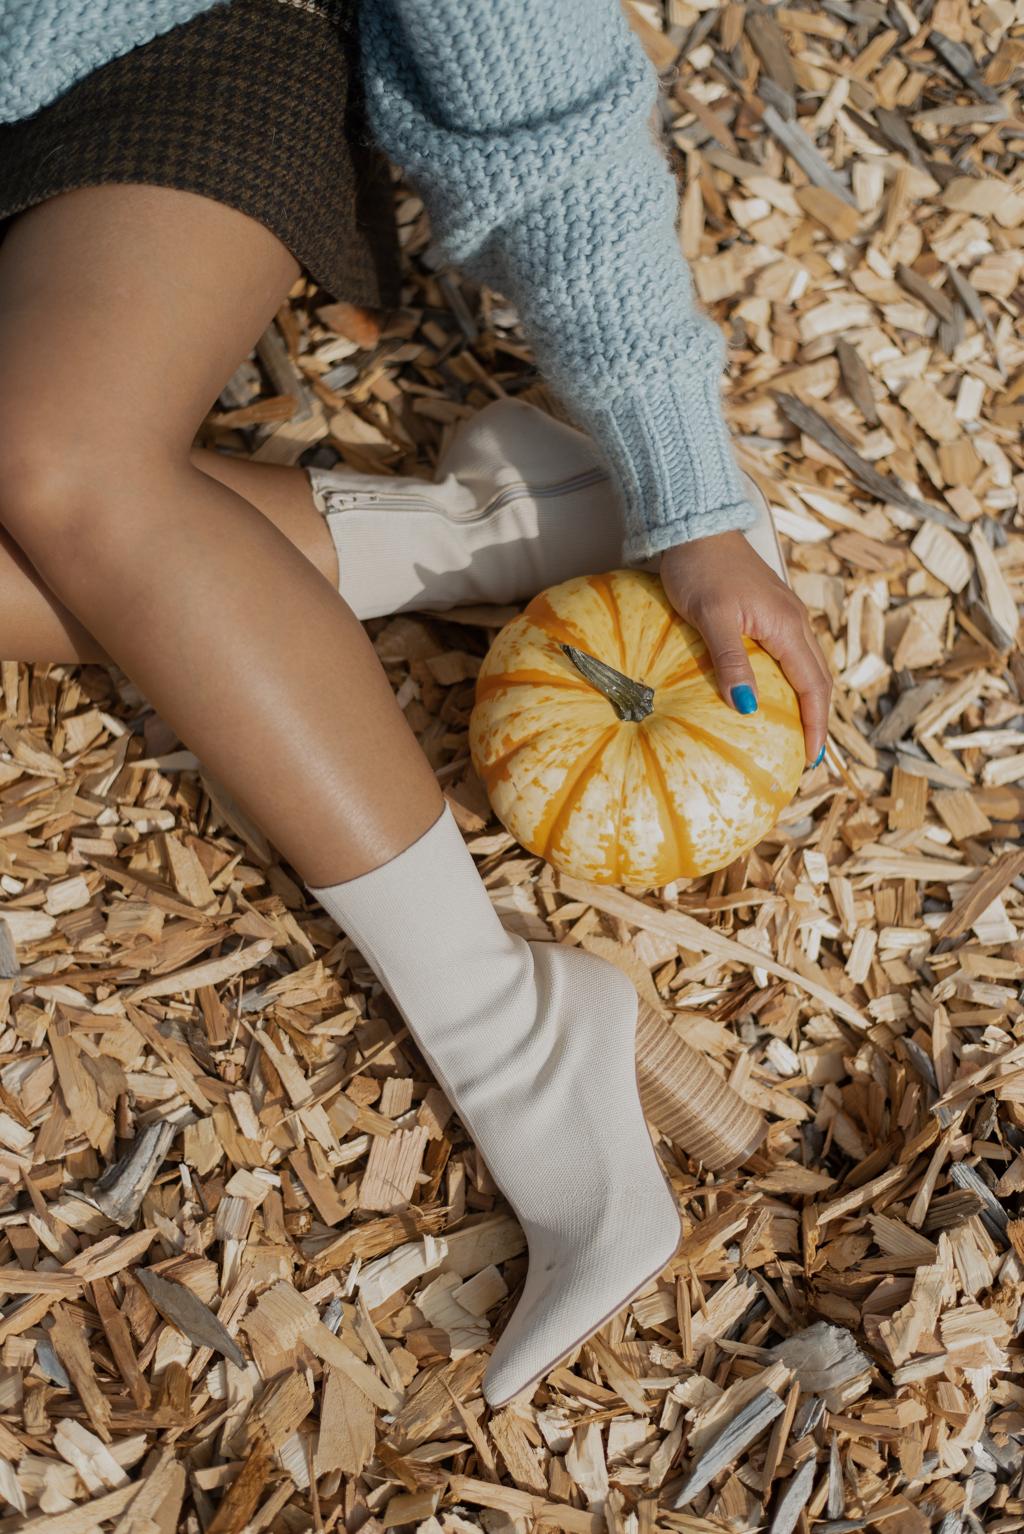 photo diary: pacific northwest pumpkin patch photoshoot - Karya Schanilec Photography